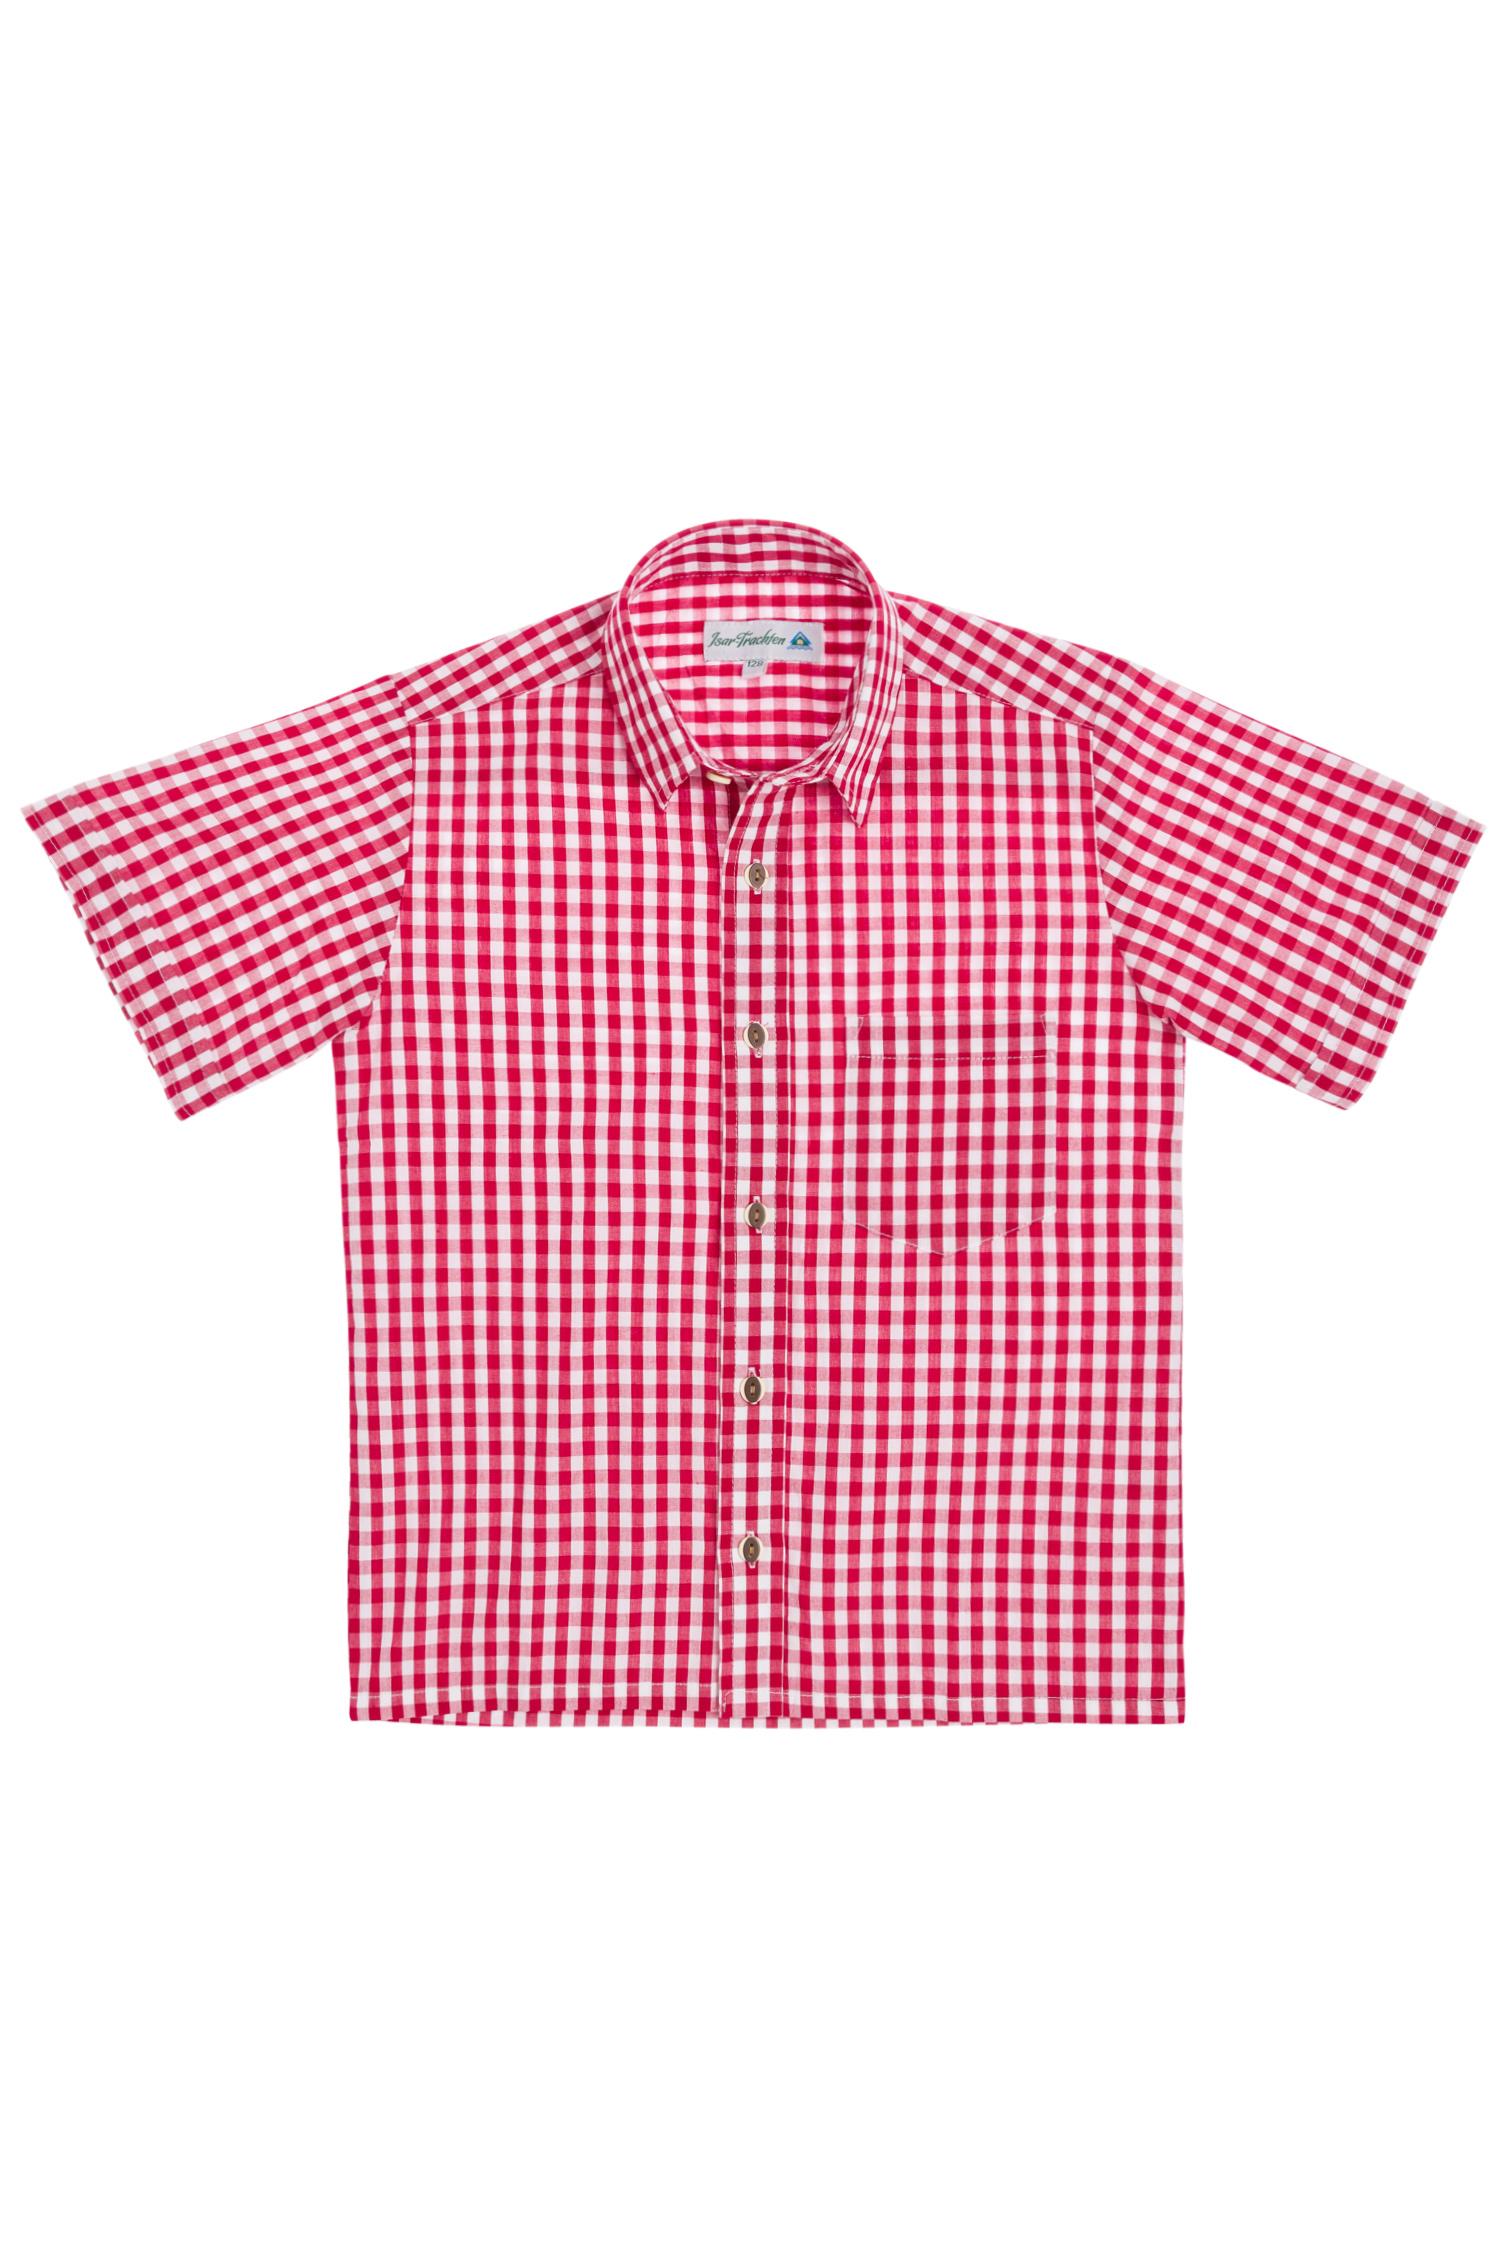 Kinderhemd kurzarm 74 | rot